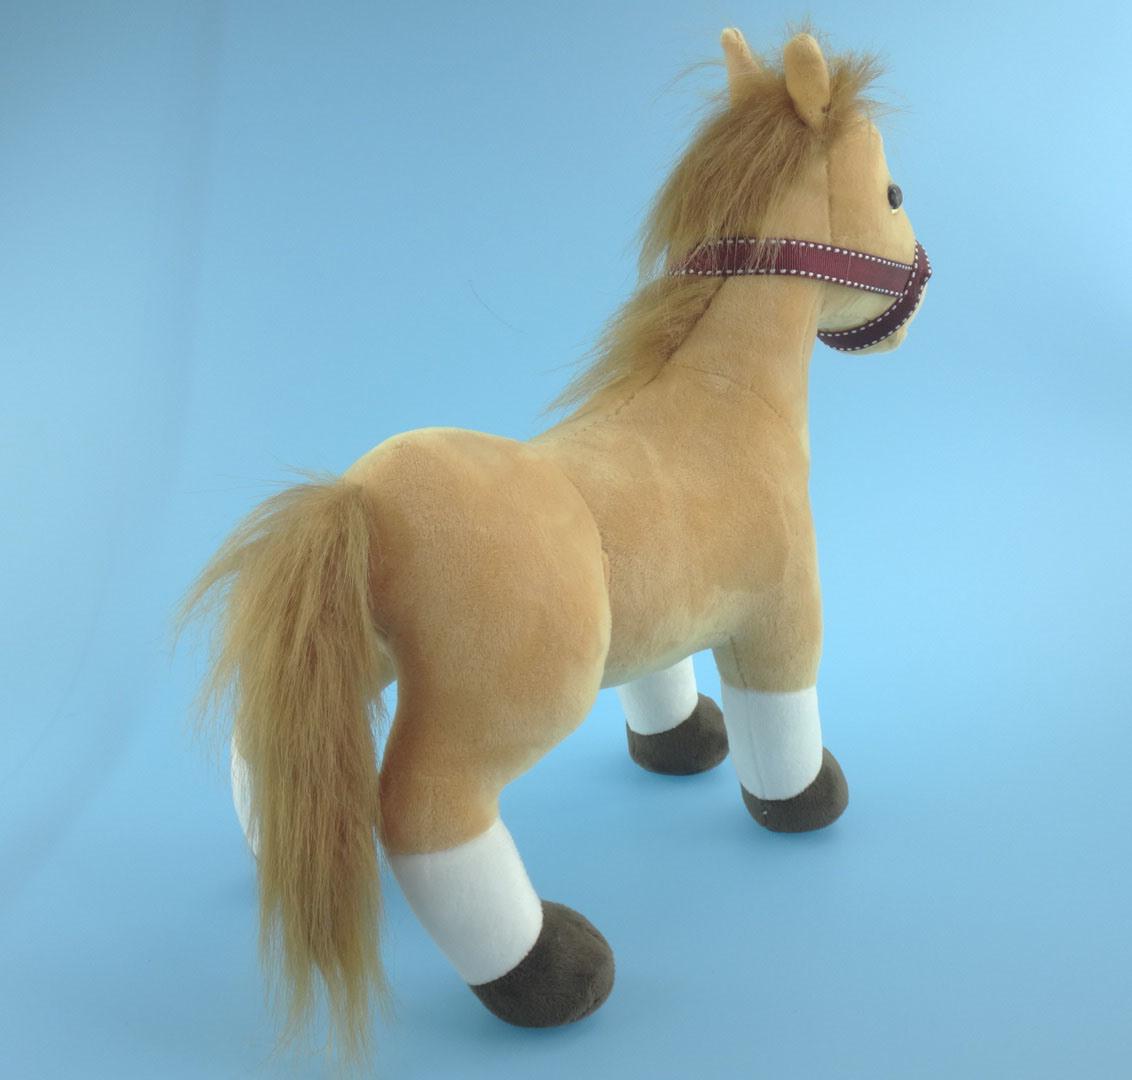 Soft Stuffed Plush Toy Horse